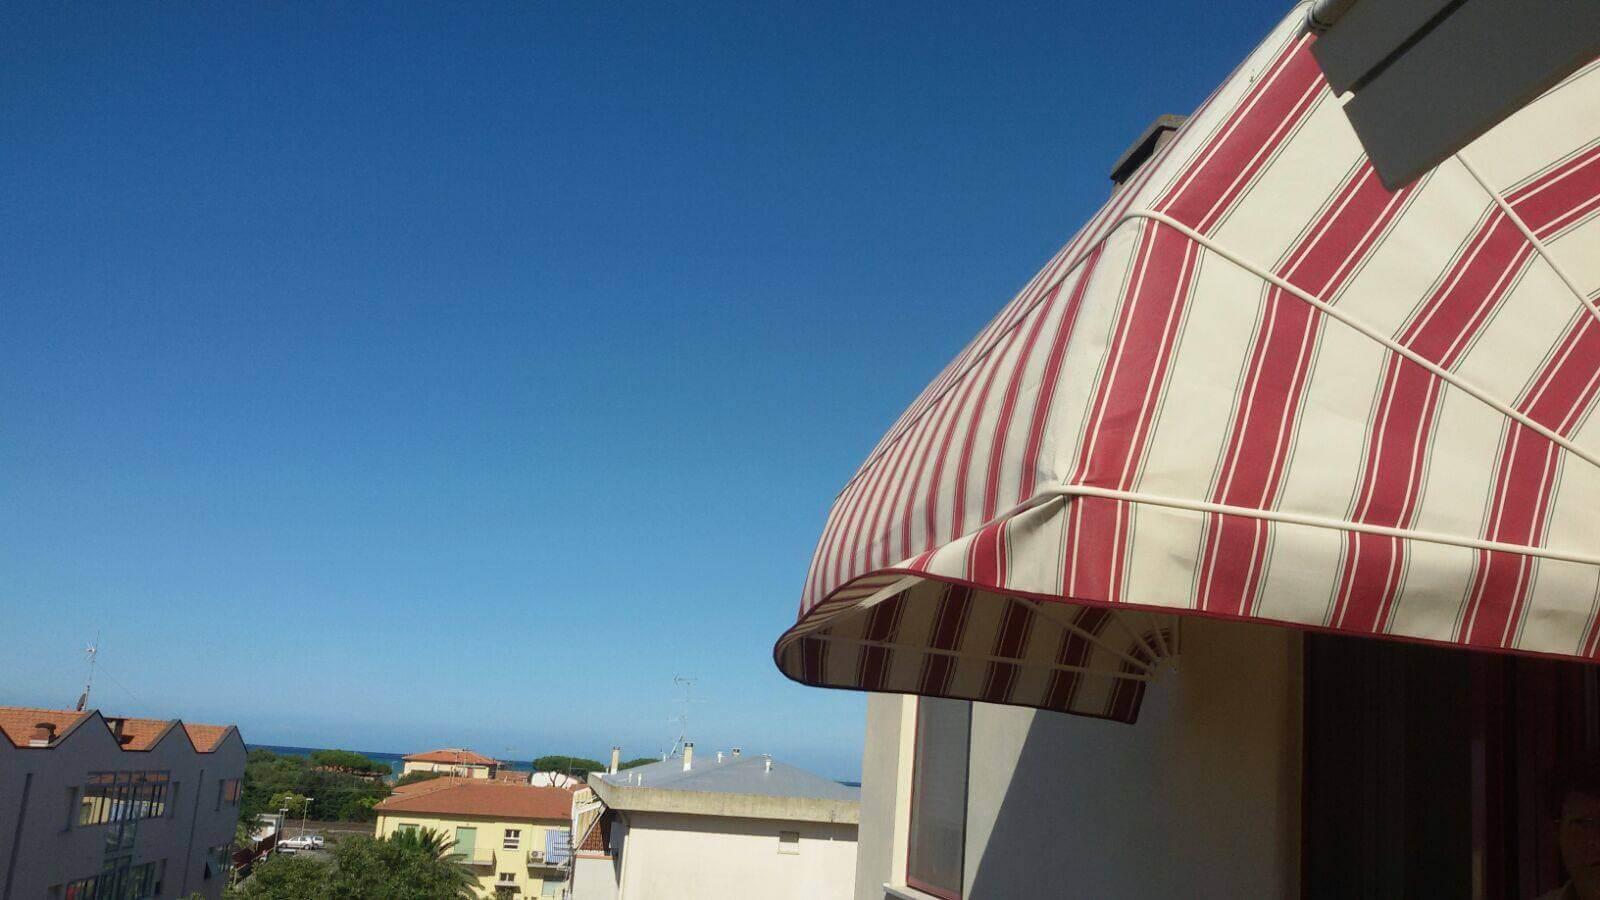 cappottina-a-righe-a-San-Vincenzo